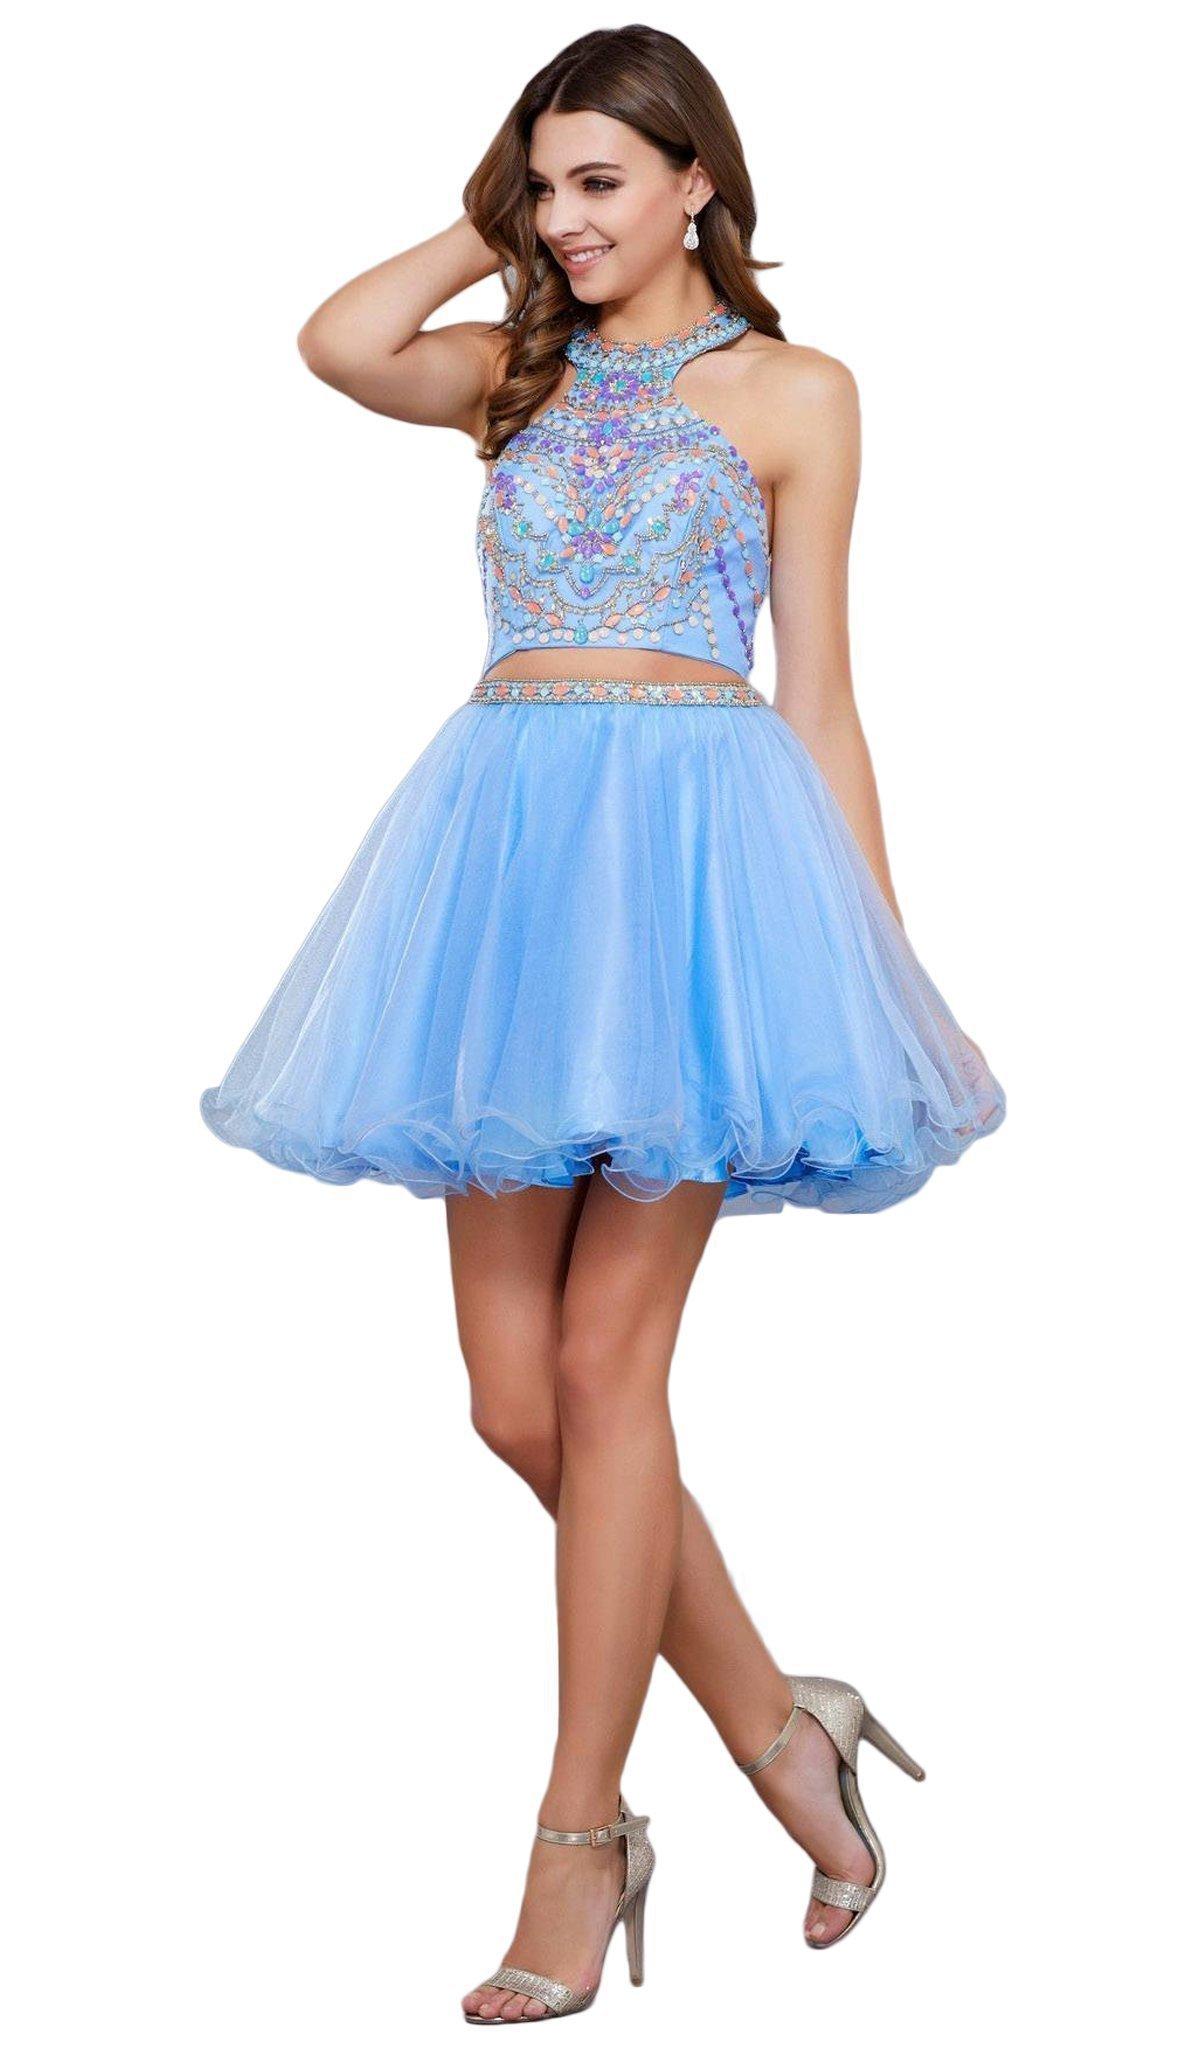 Nox Anabel - 6259 Two-Piece Halter Beaded Bodice Dress